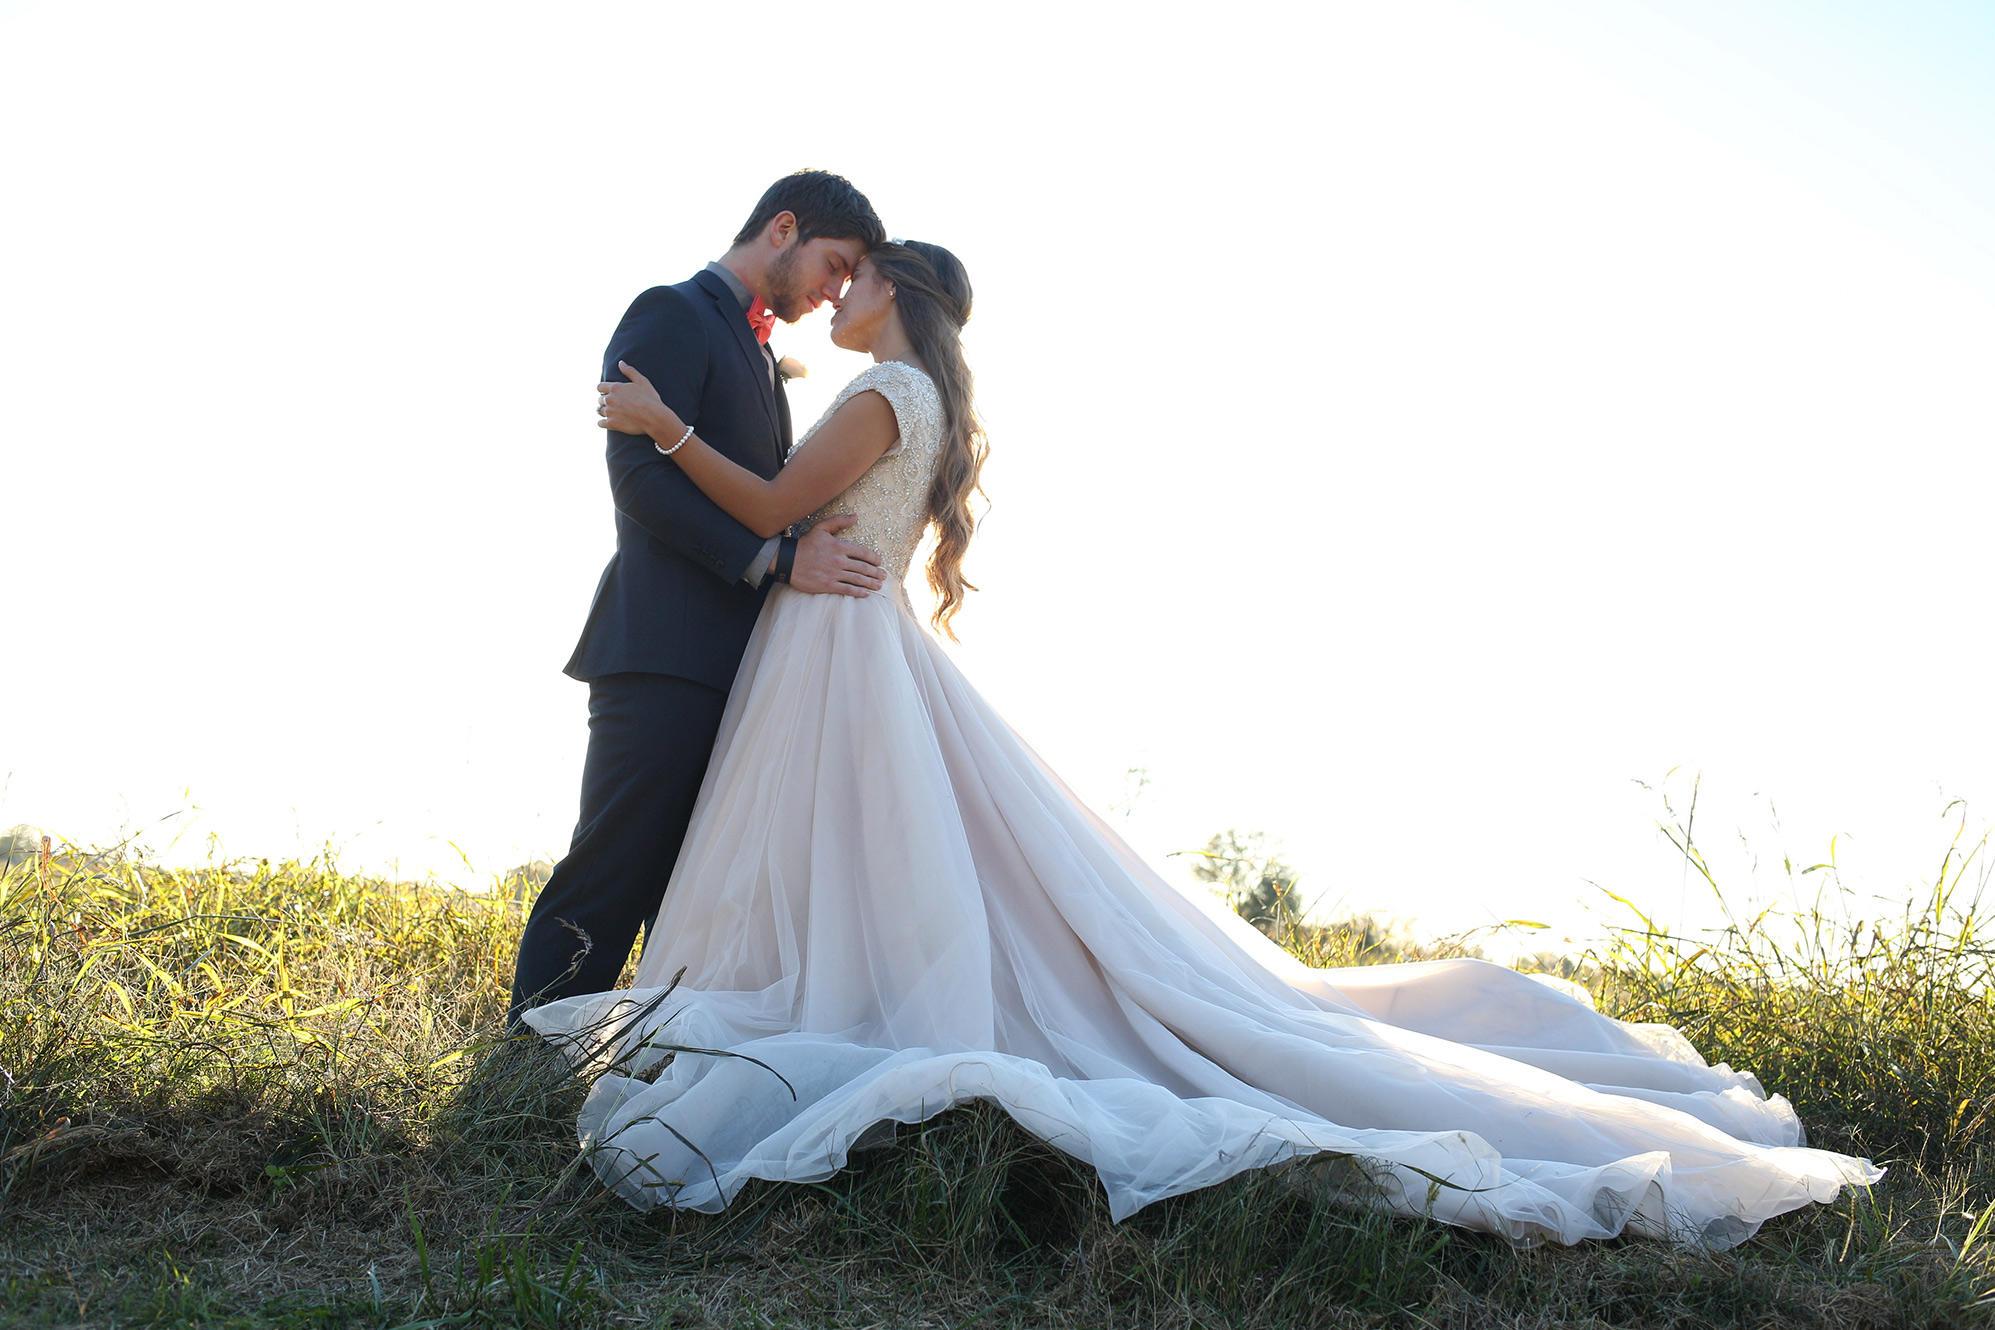 Wedding Jessa Wedding Dress jessa duggar and ben seewalds romantic wedding photo gallery 19 kids 28